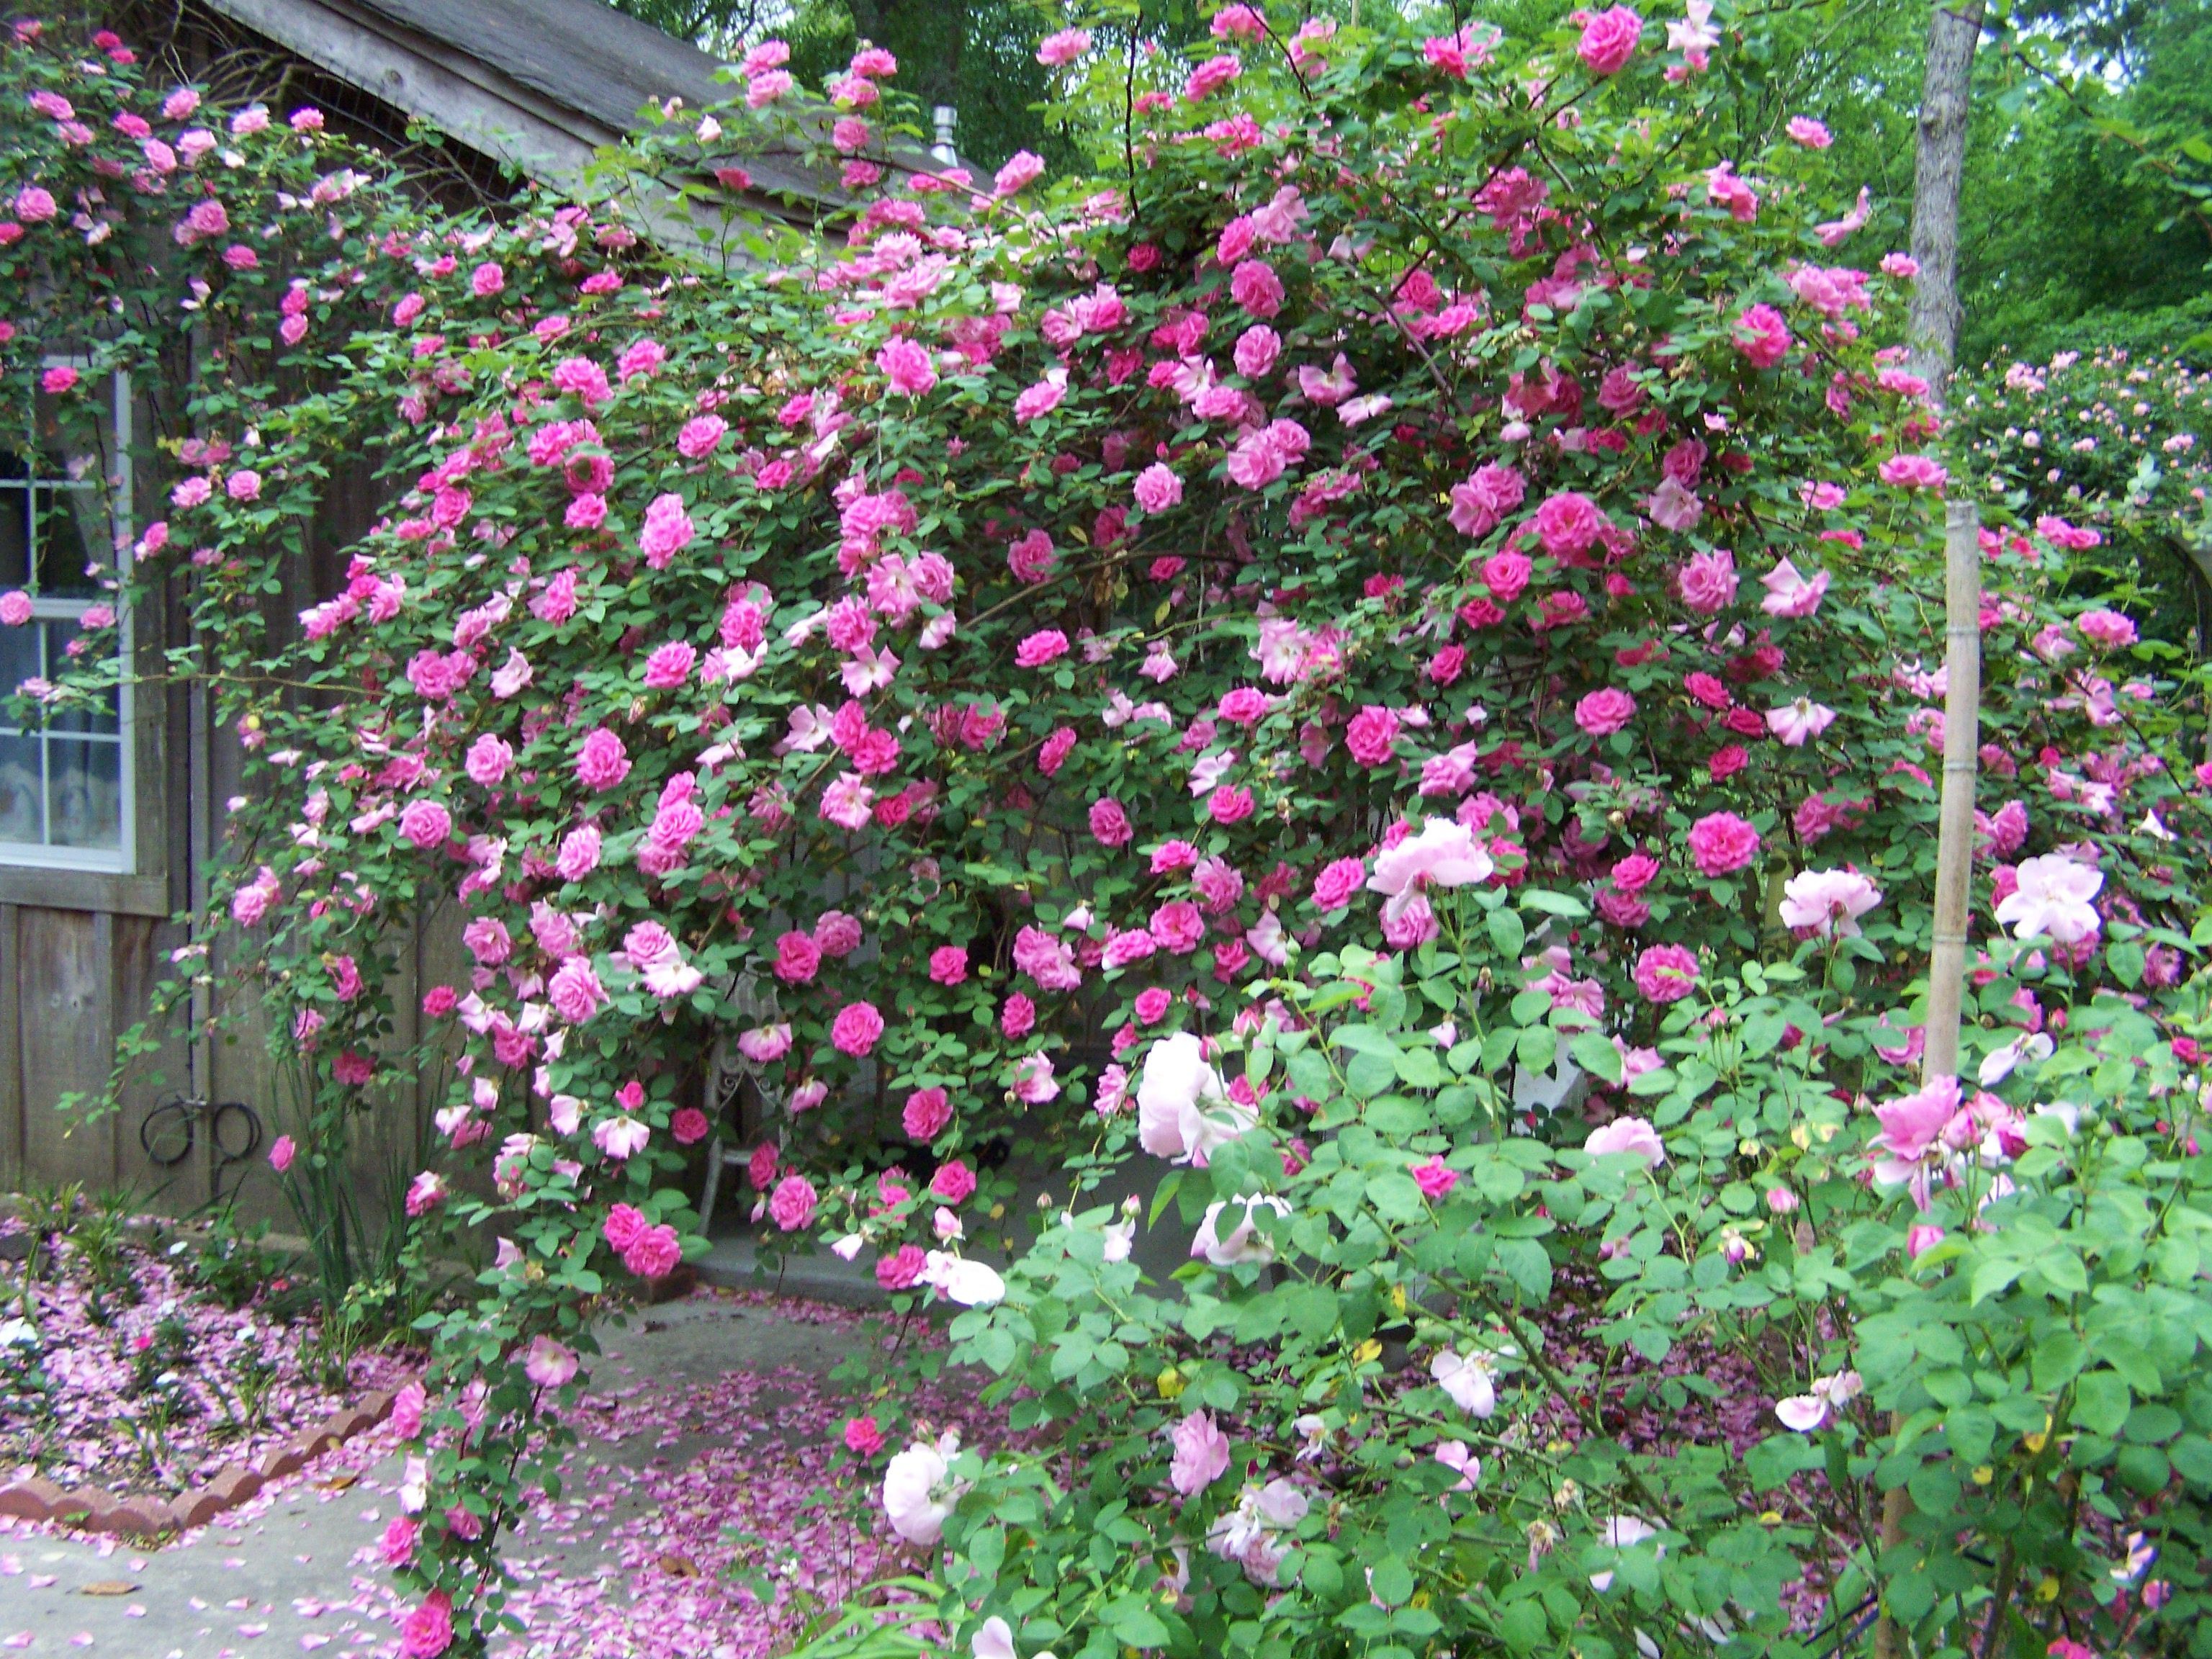 Zephirine Drouhin Climbing Rose zephirine drouhin rose- an old fashion climbing, thornless